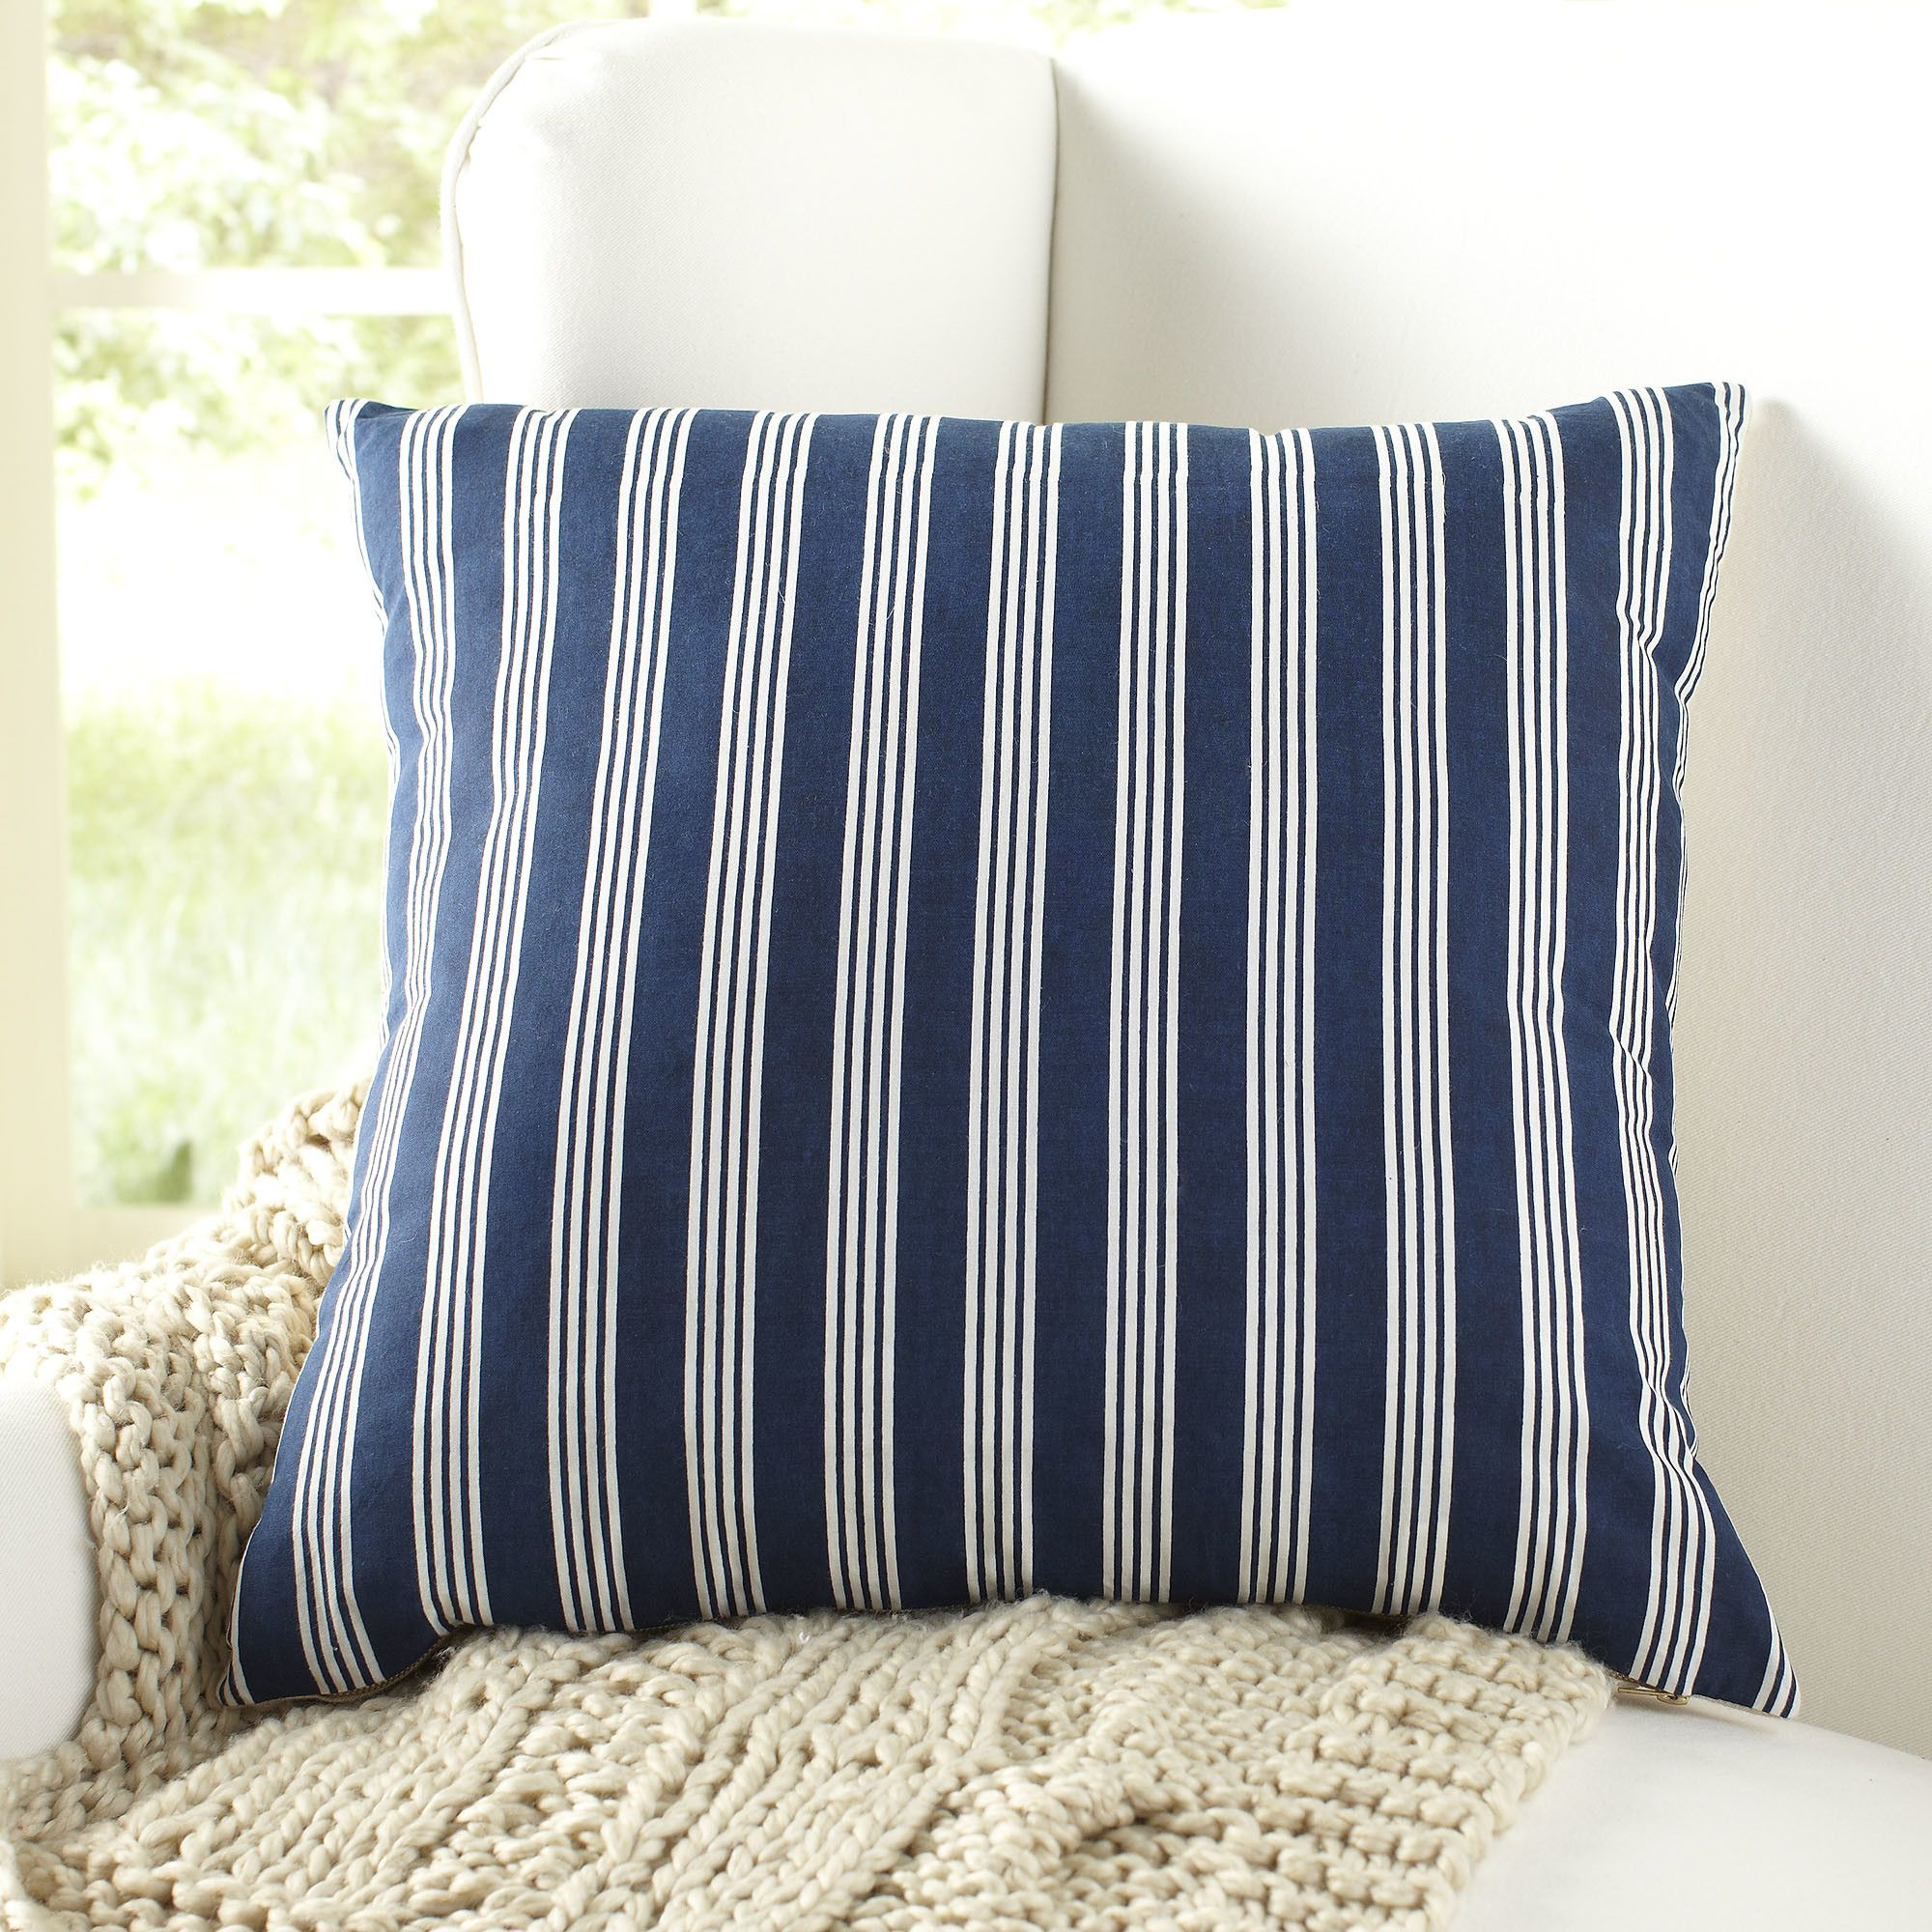 Birch lane vaughn striped pillow cover coastal style decor